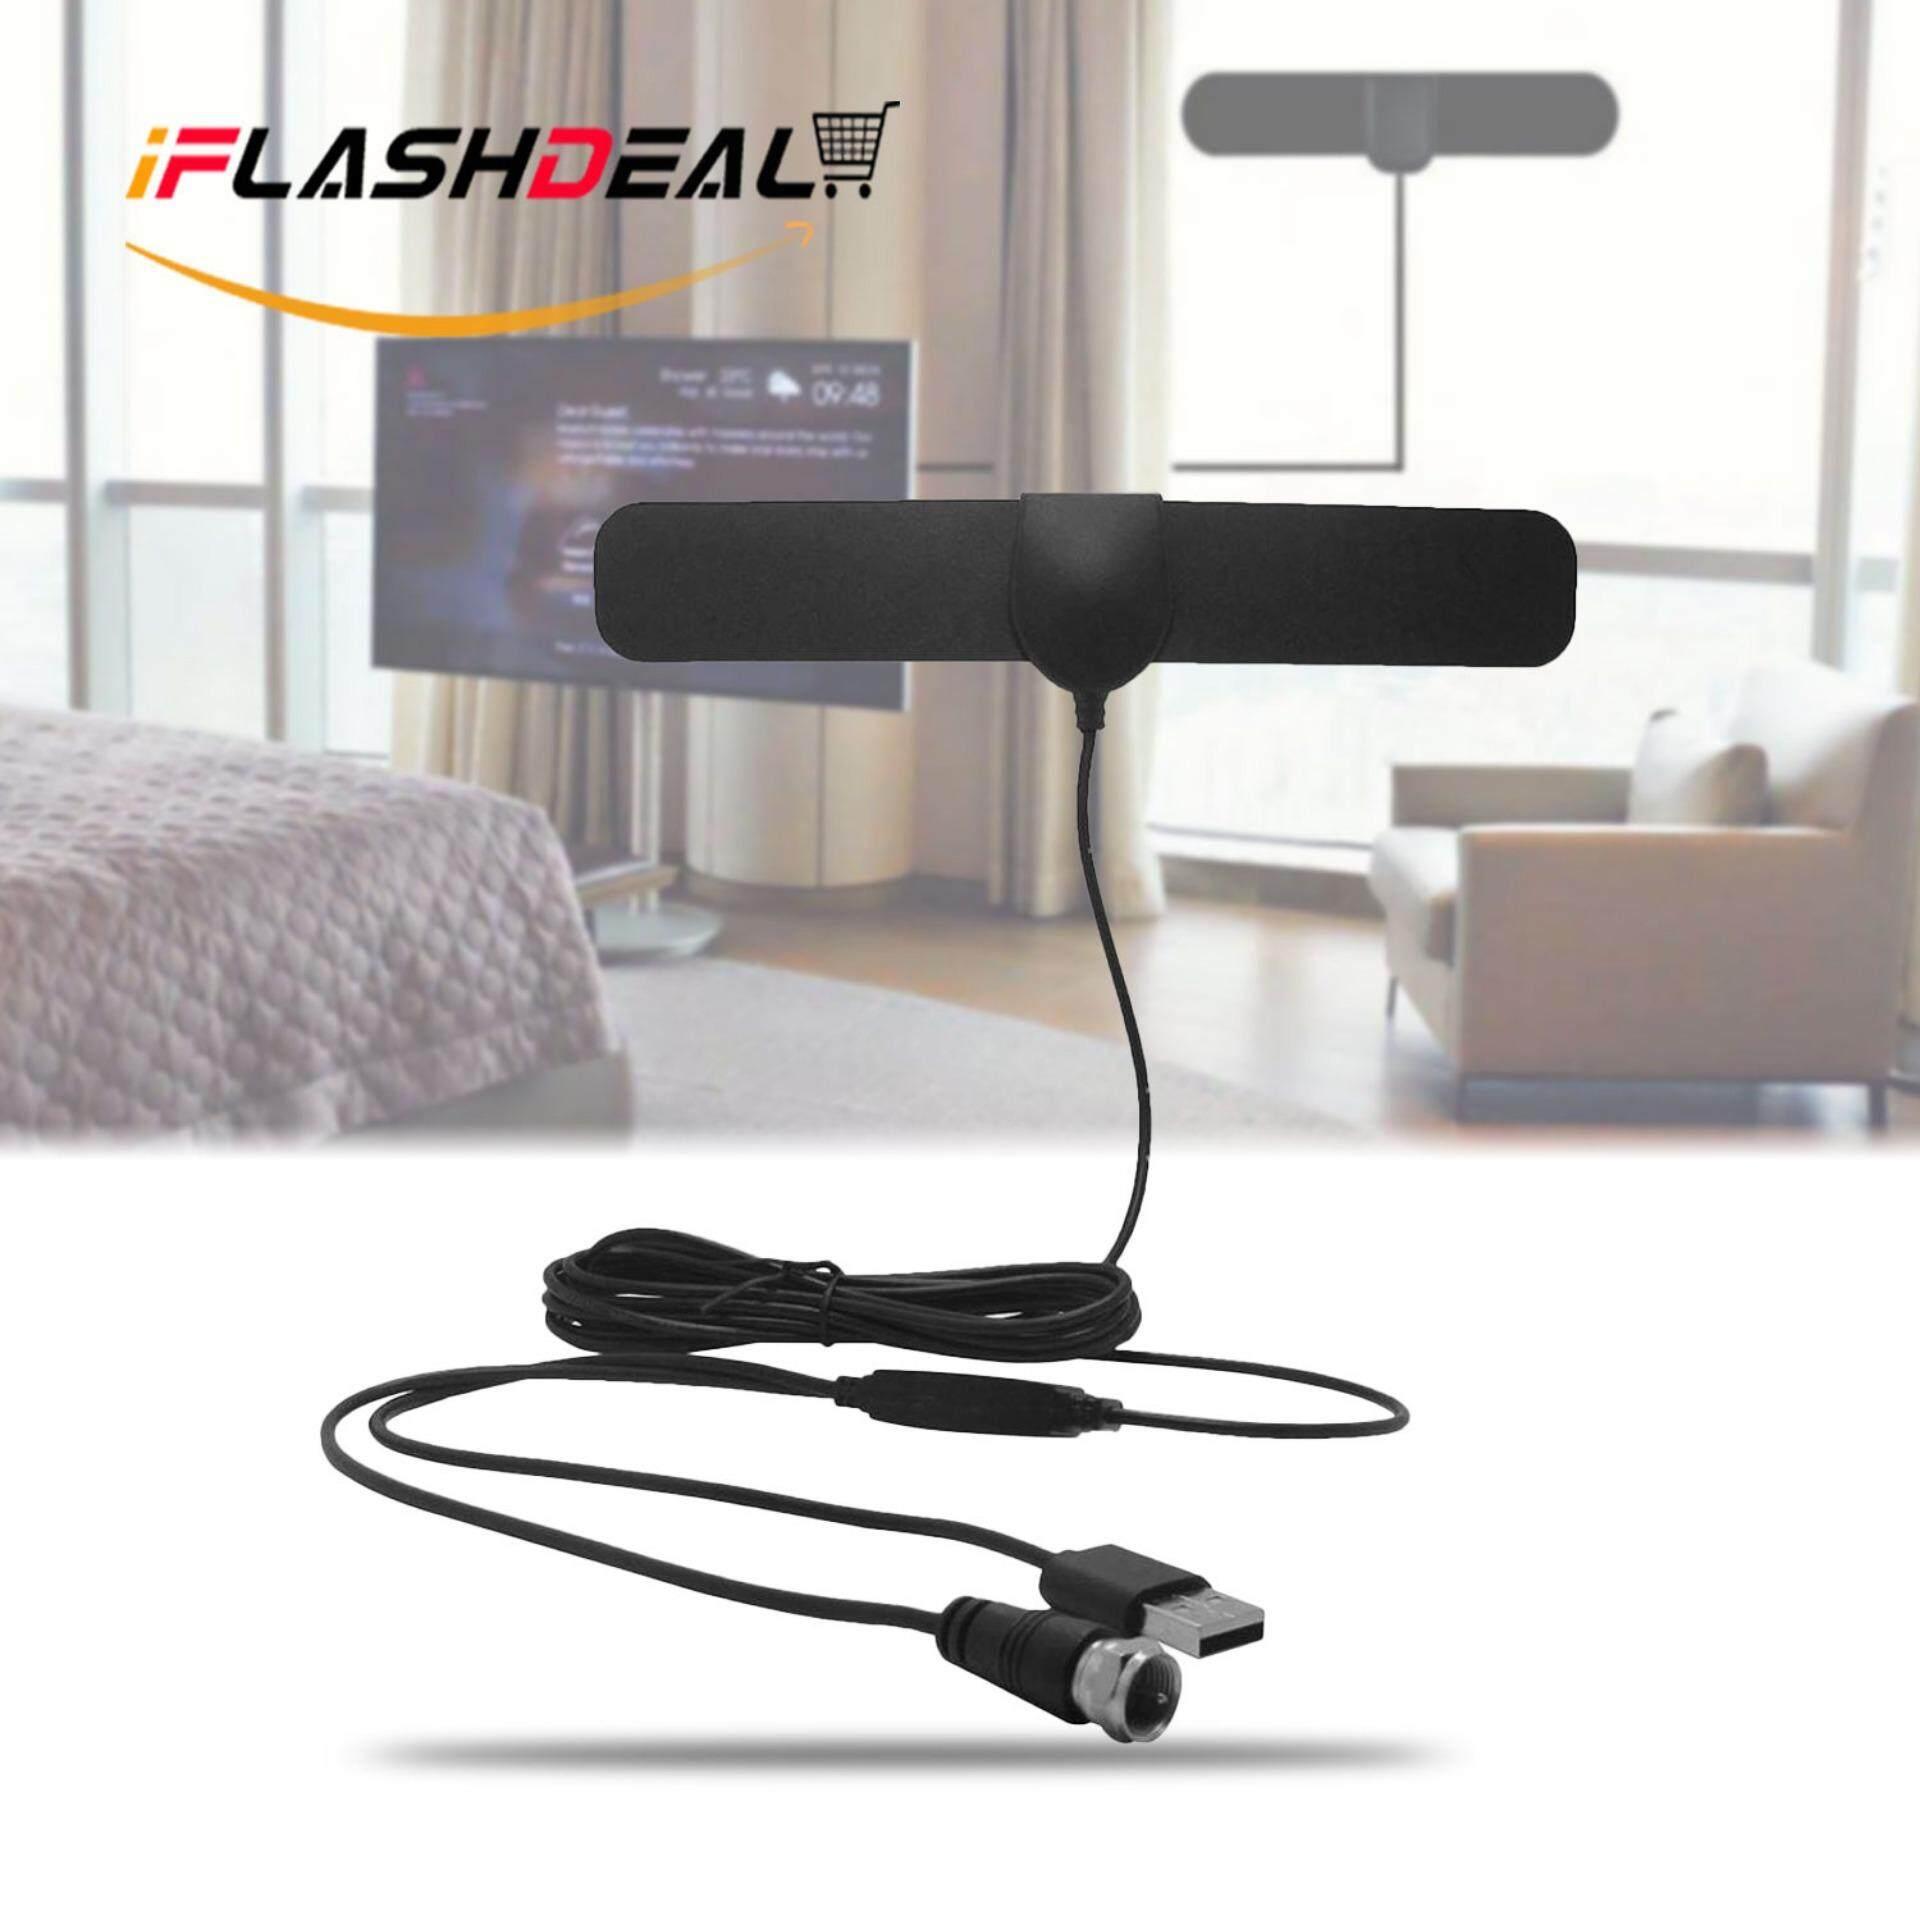 Iflashdeal แอมพลิฟายด์เสาอากาศทีวีดิจิตอล Hd ยาว 50 ไมล์รองรับทีวี 1080p ในร่มที่มีประสิทธิภาพ Hdtv เครื่องขยายสัญญาณแอมป์ - 4 ม. เคเบิ้ล Amplified Hd Digital Tv Antenna By Iflashdeal.